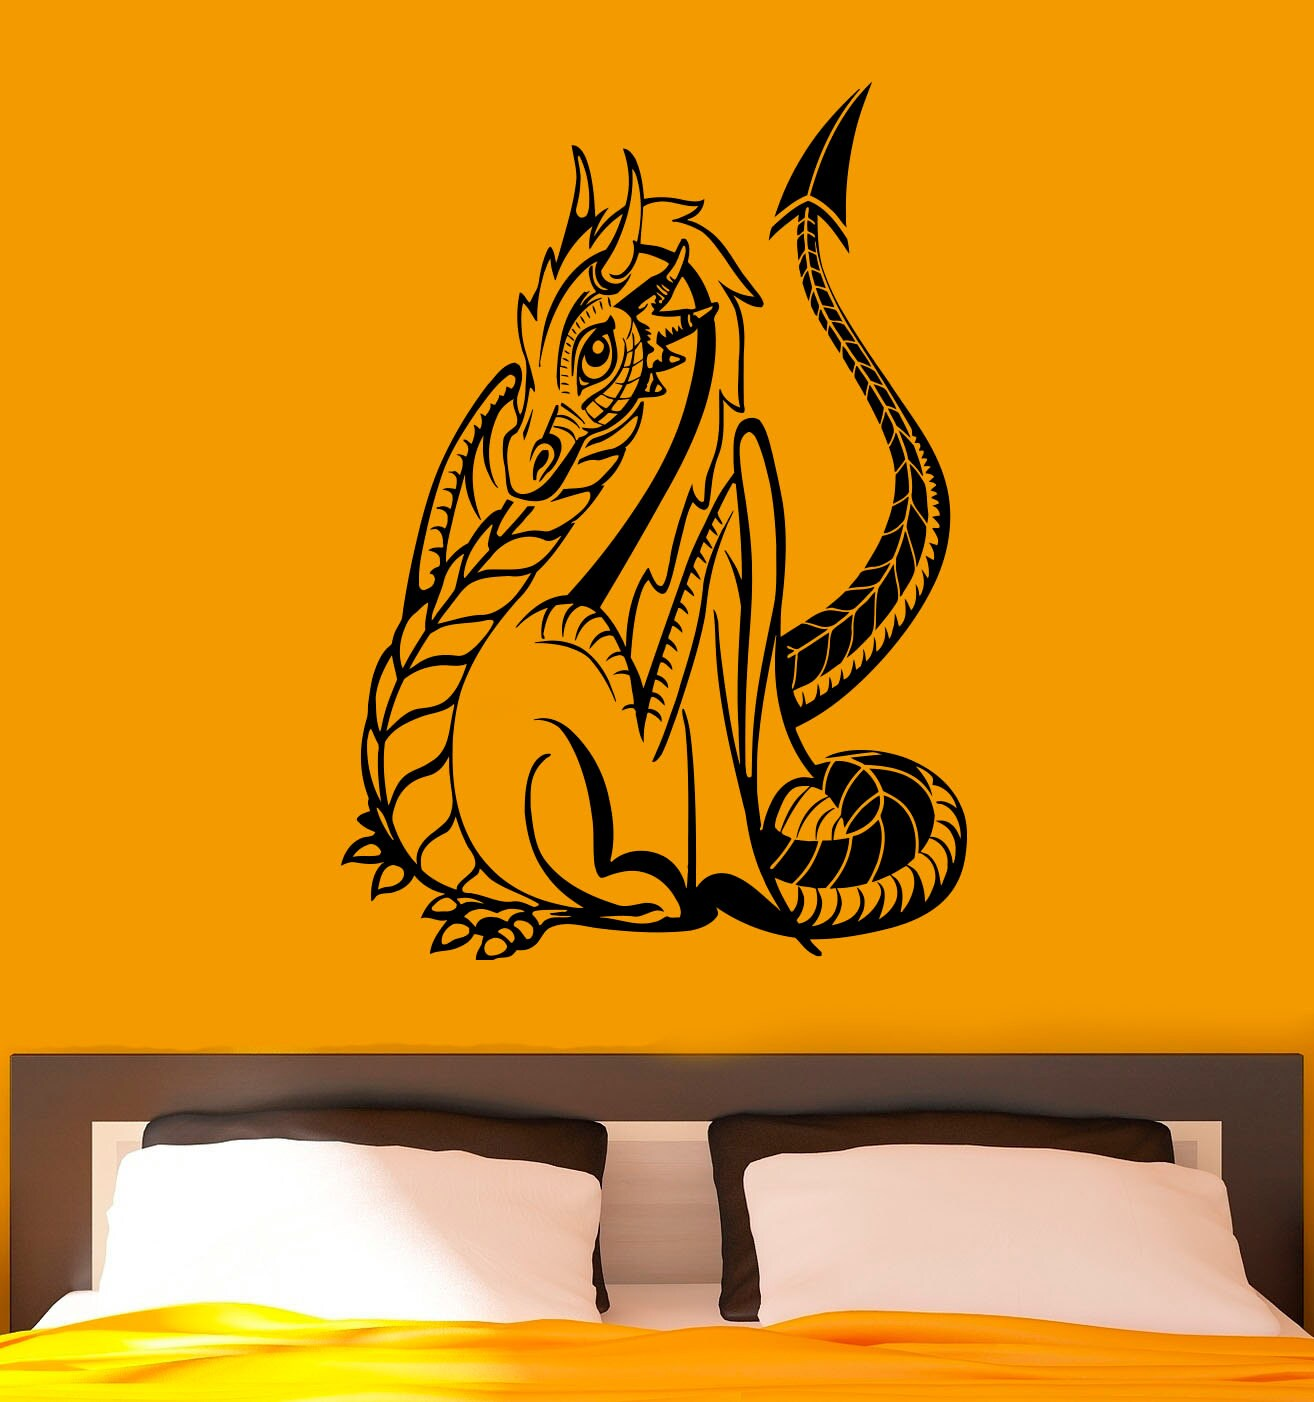 Hakuna Matata Wall Stickers Dragon Wall Decal Vinyl Stickers Gothic Style Fantasy Home